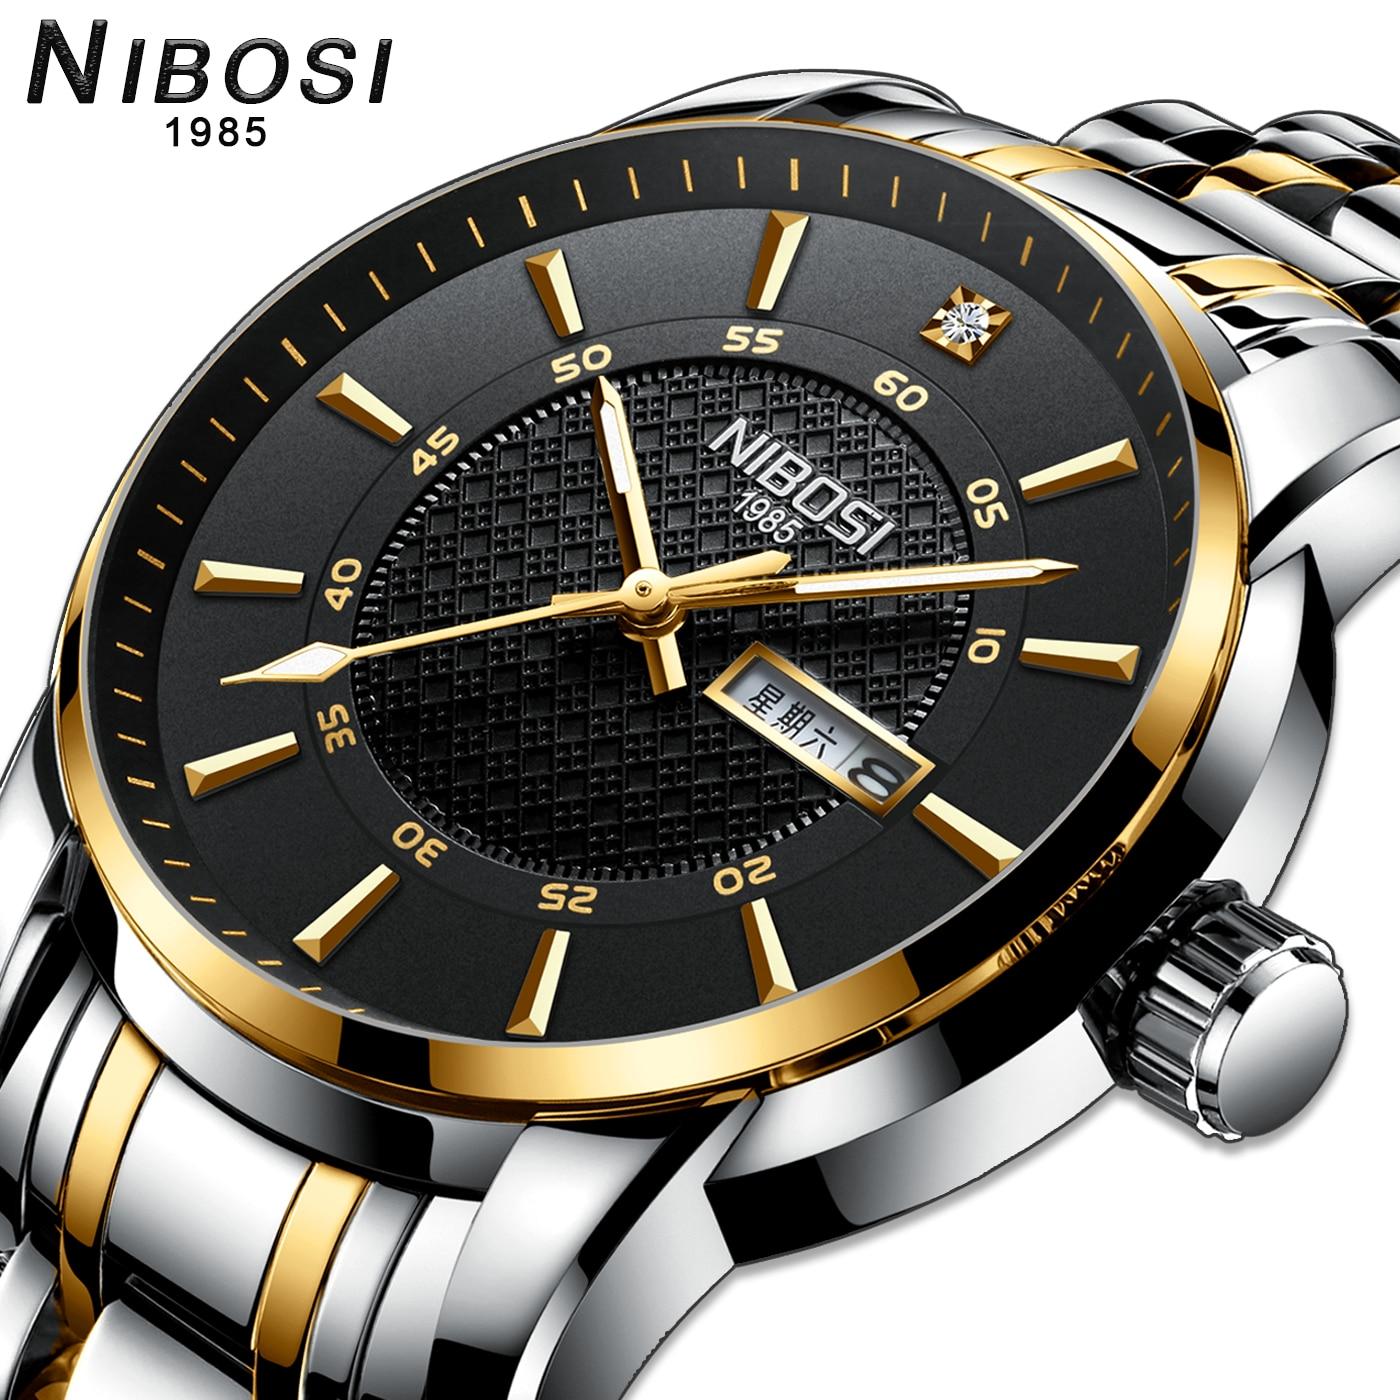 NIBOSI Relogio Masculino Clocks men Quartz wrist watch men's fashion casual watches top Luxury brand dress waterproof wristwatch